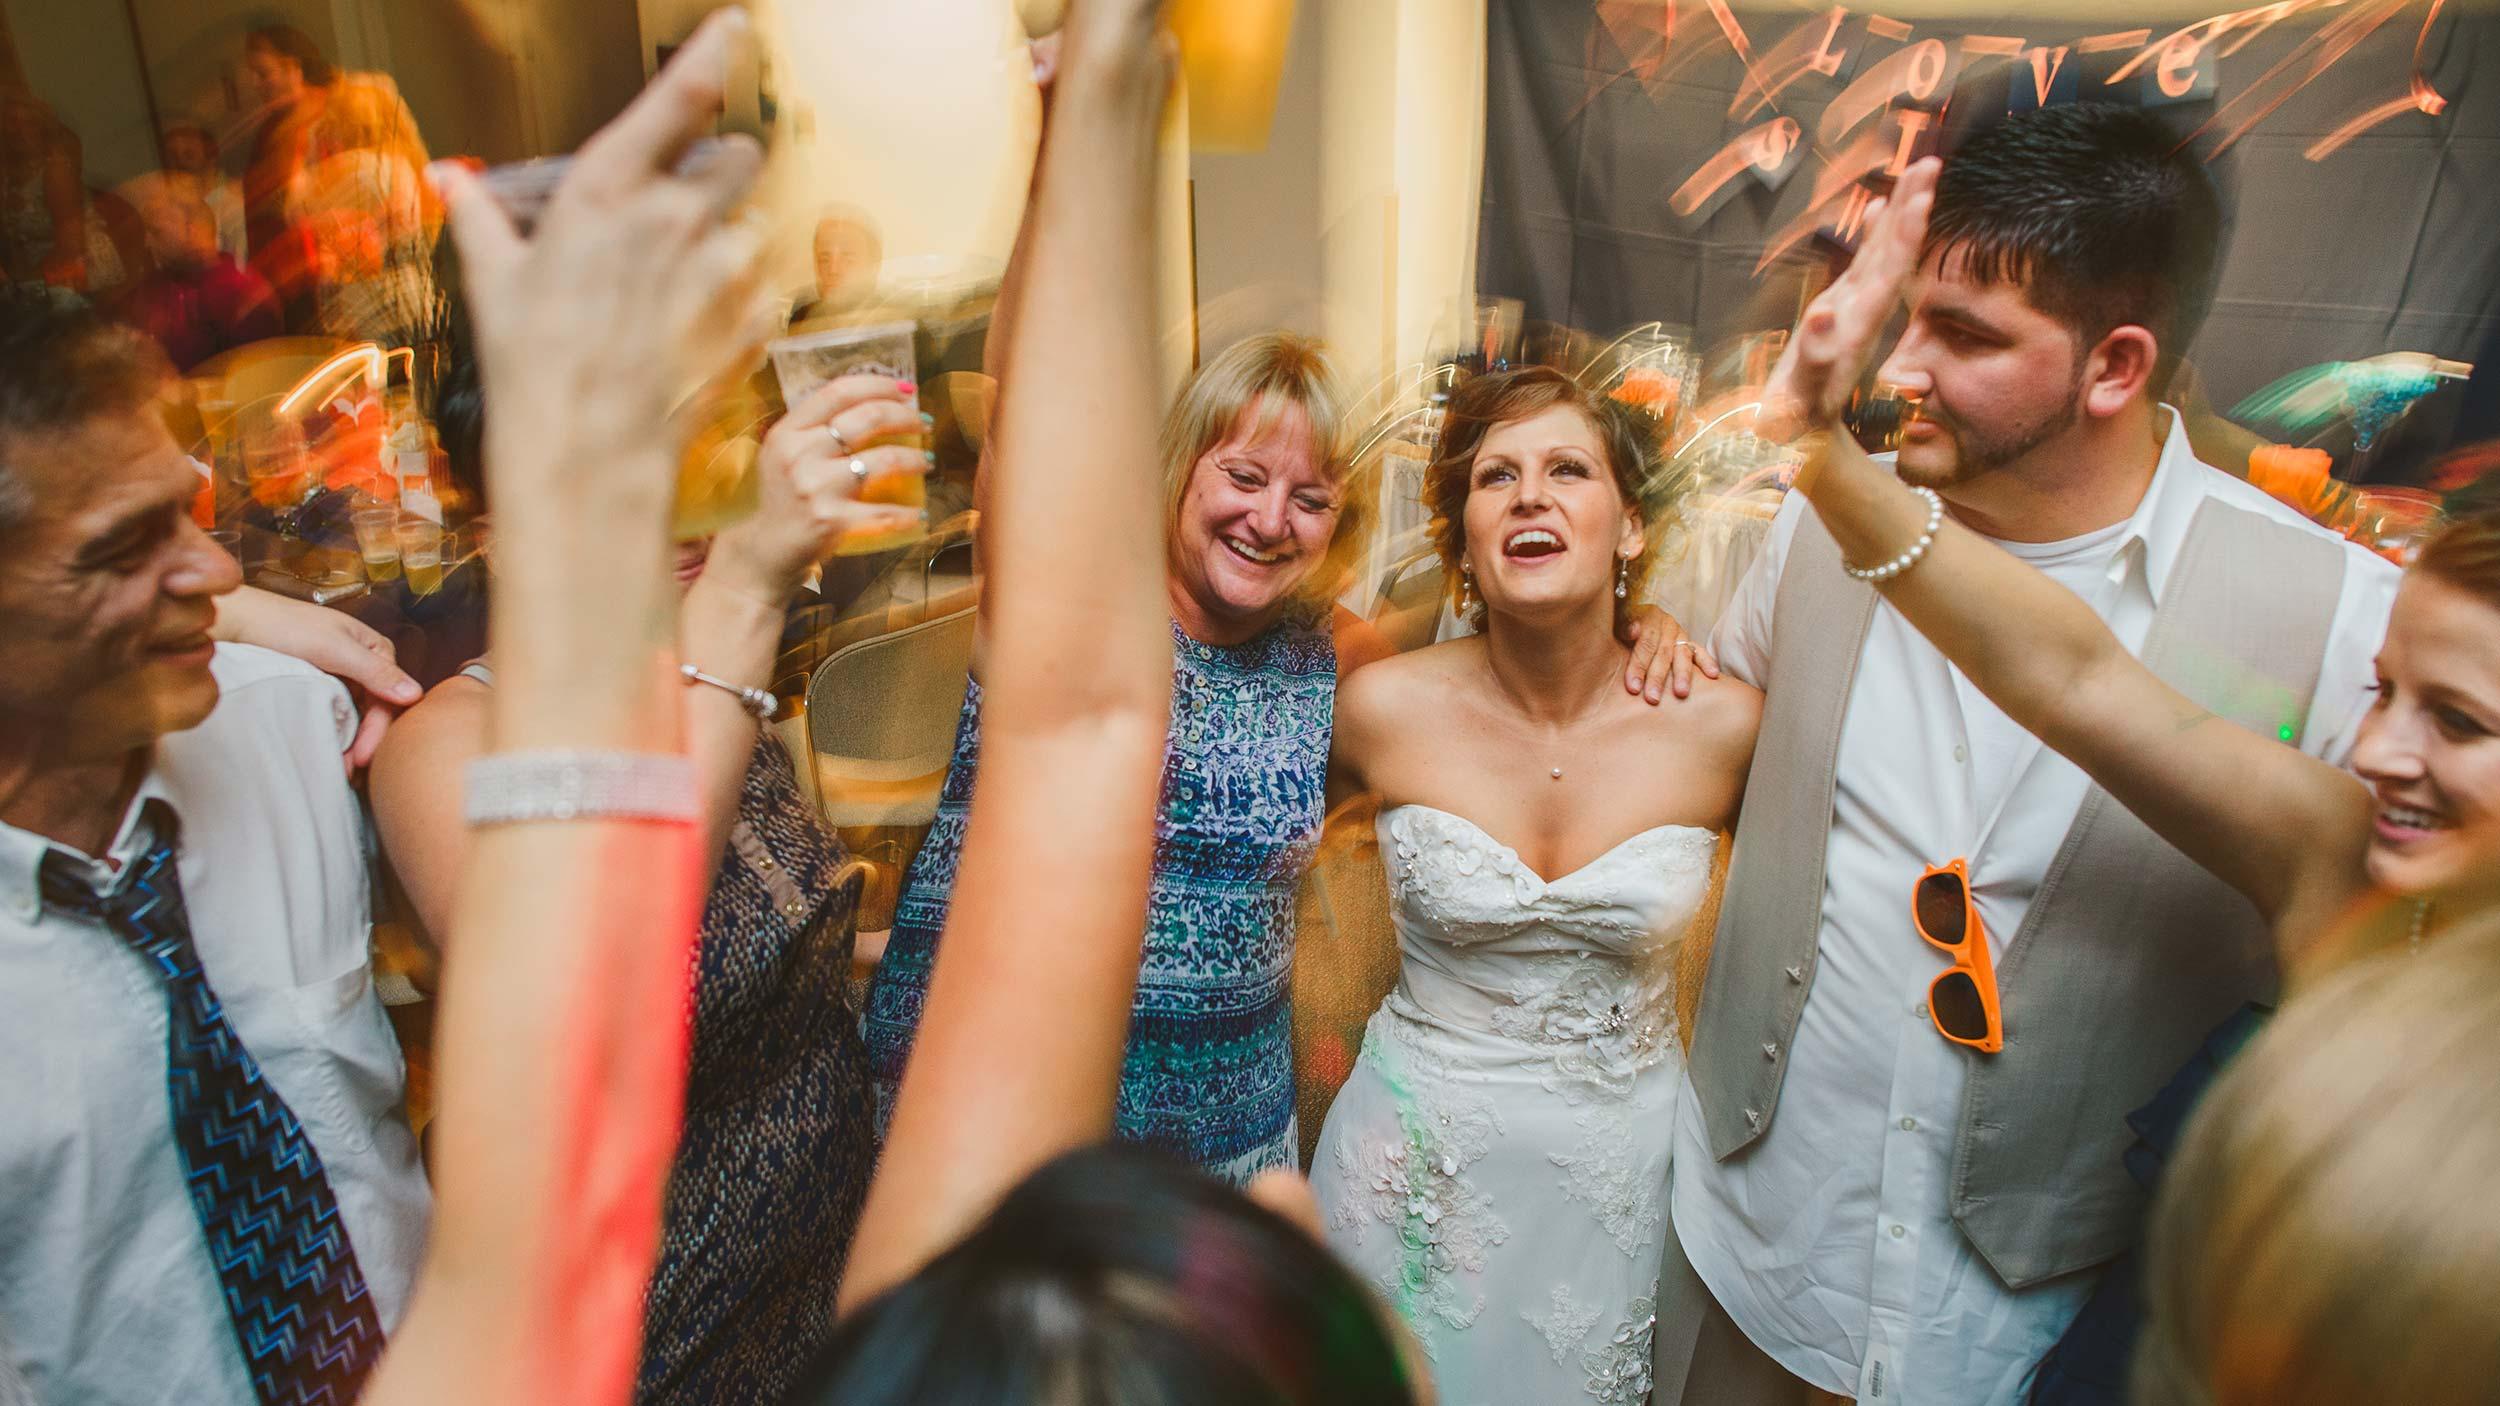 wedding-reception-bride-groom-dancefloor.jpg